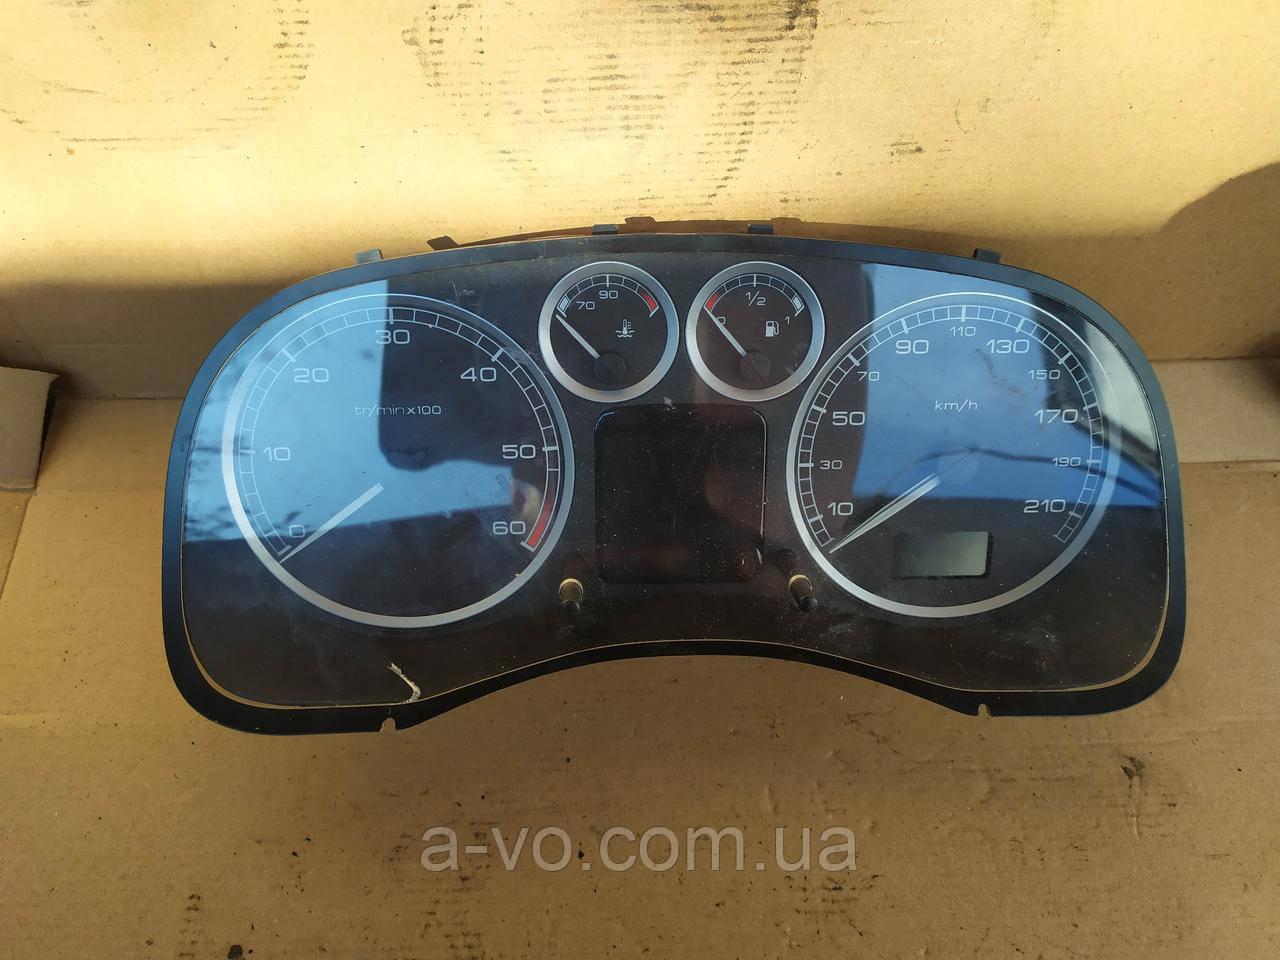 Щиток панель приборов Peugeot 307 ,1.6 HDI , P9647538480